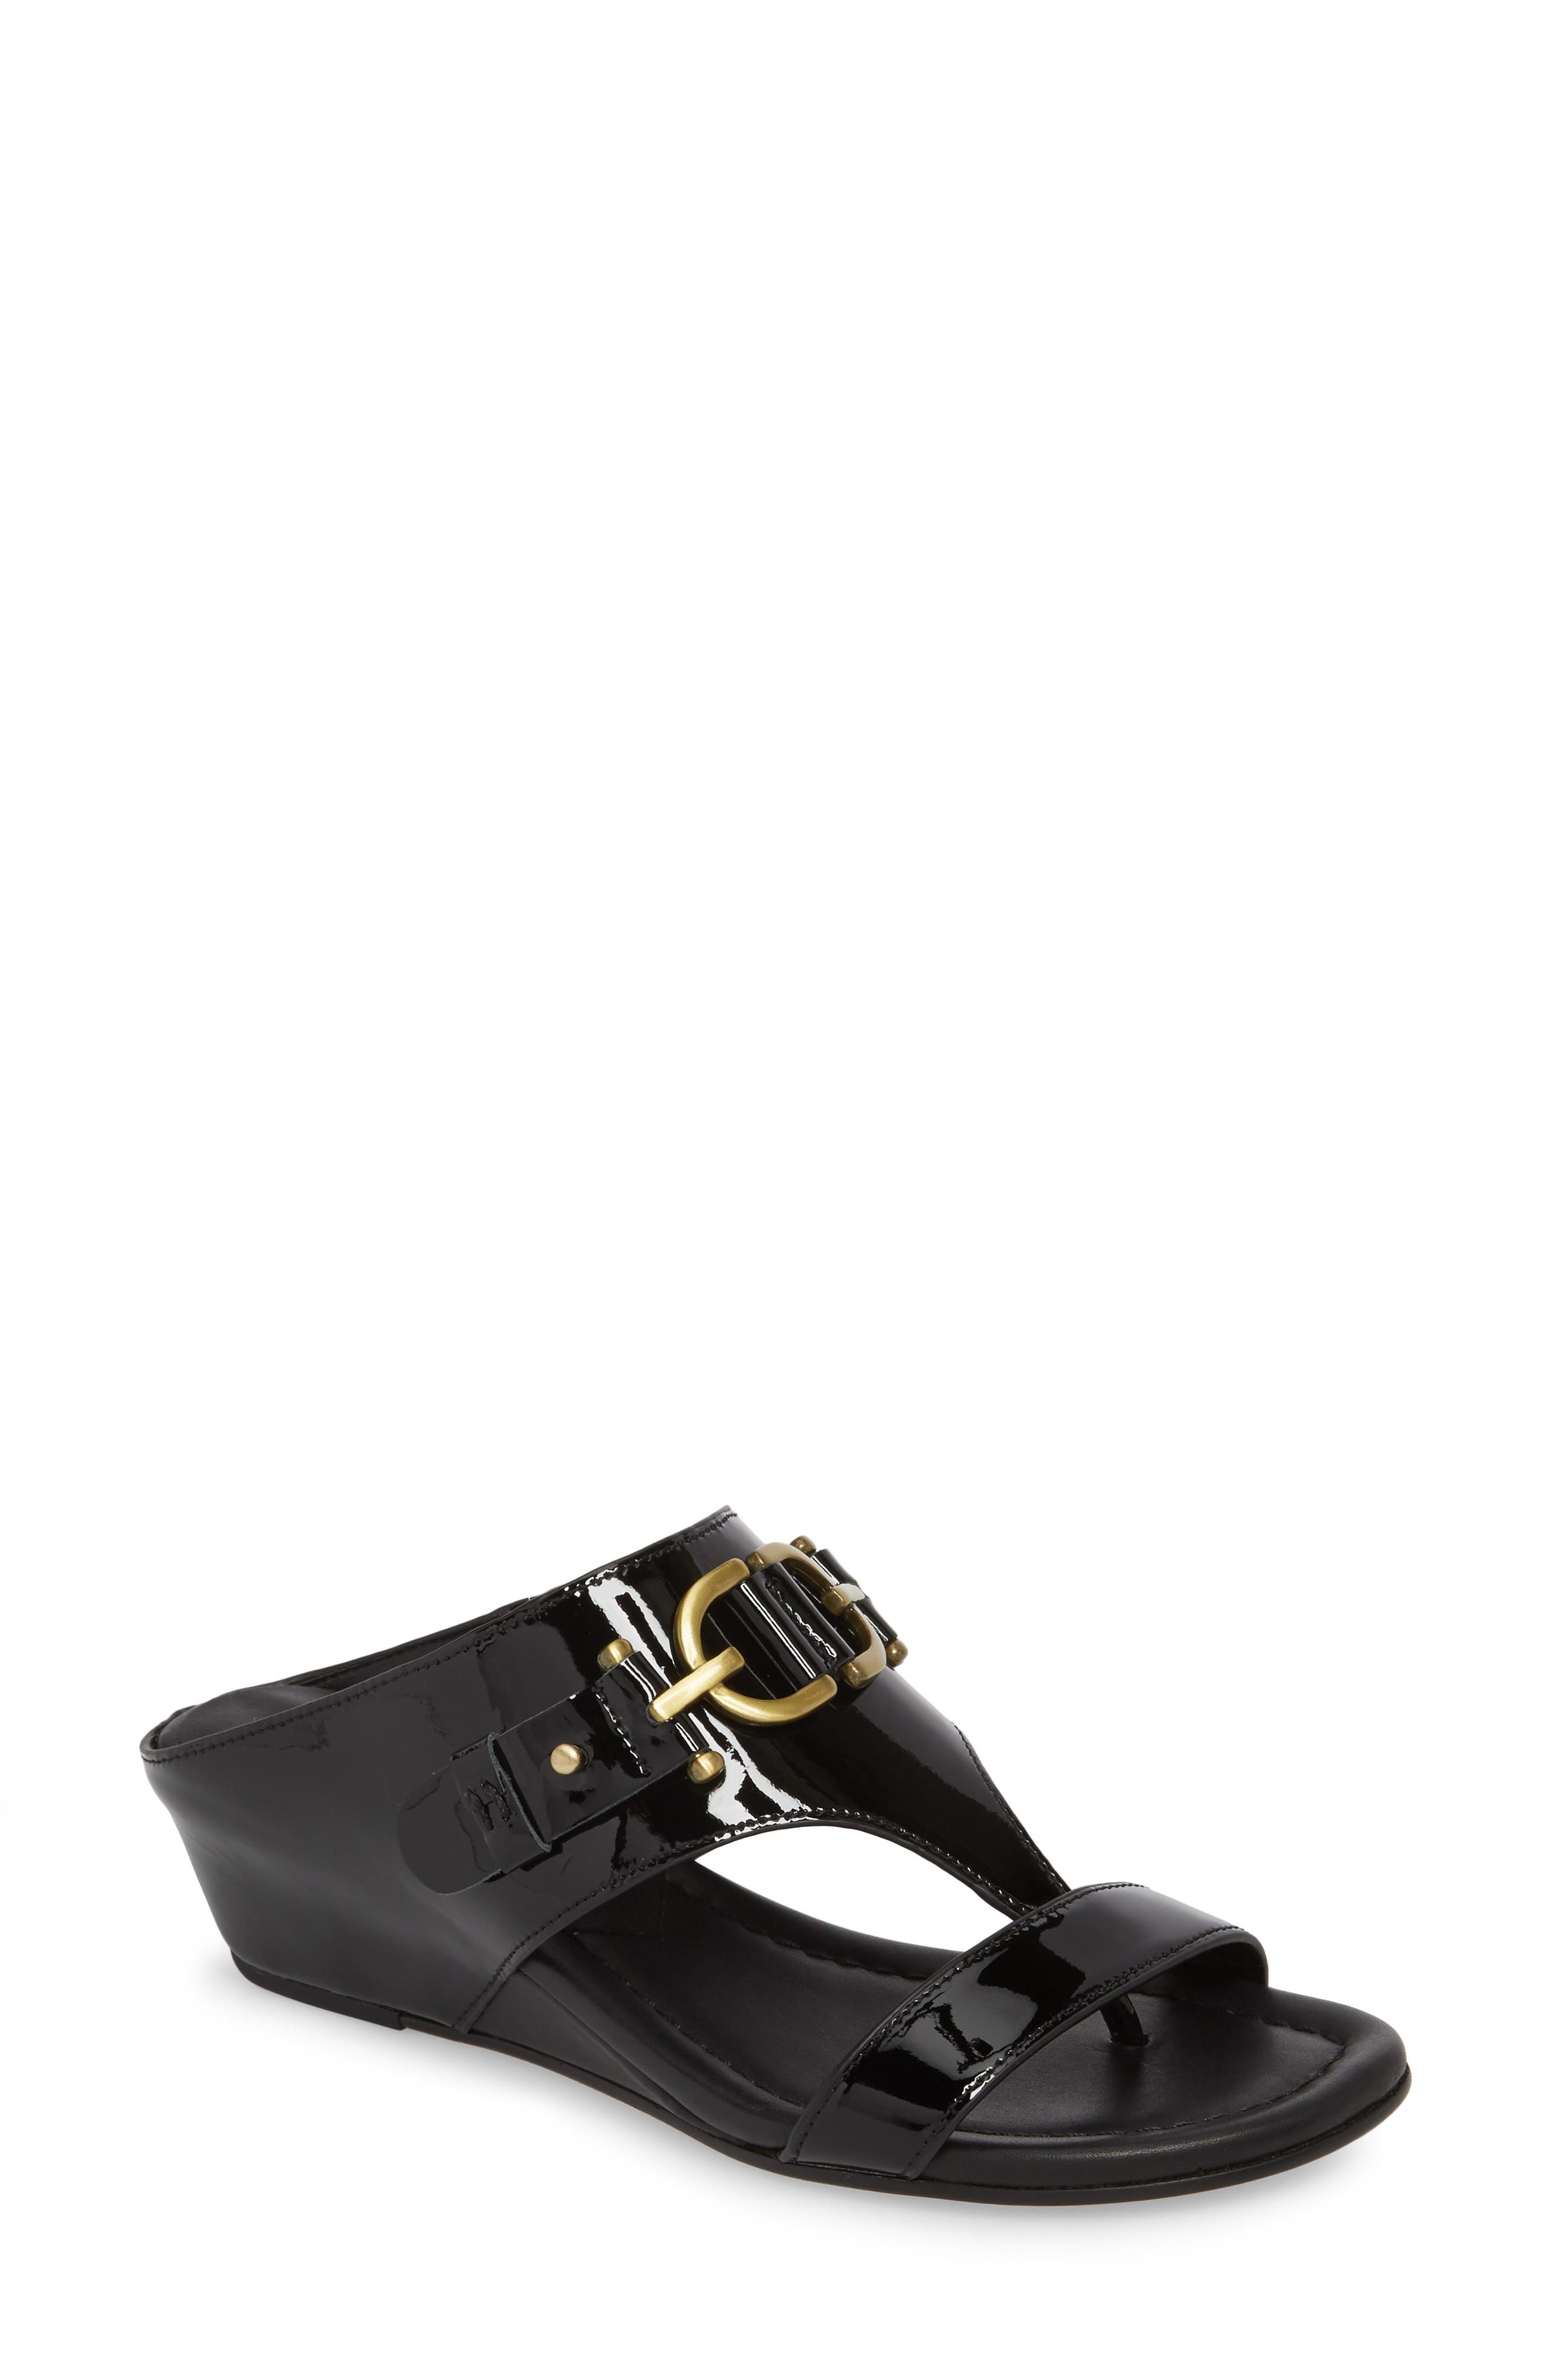 Dayna Wedge Sandal,                         Main,                         color, Black Leather